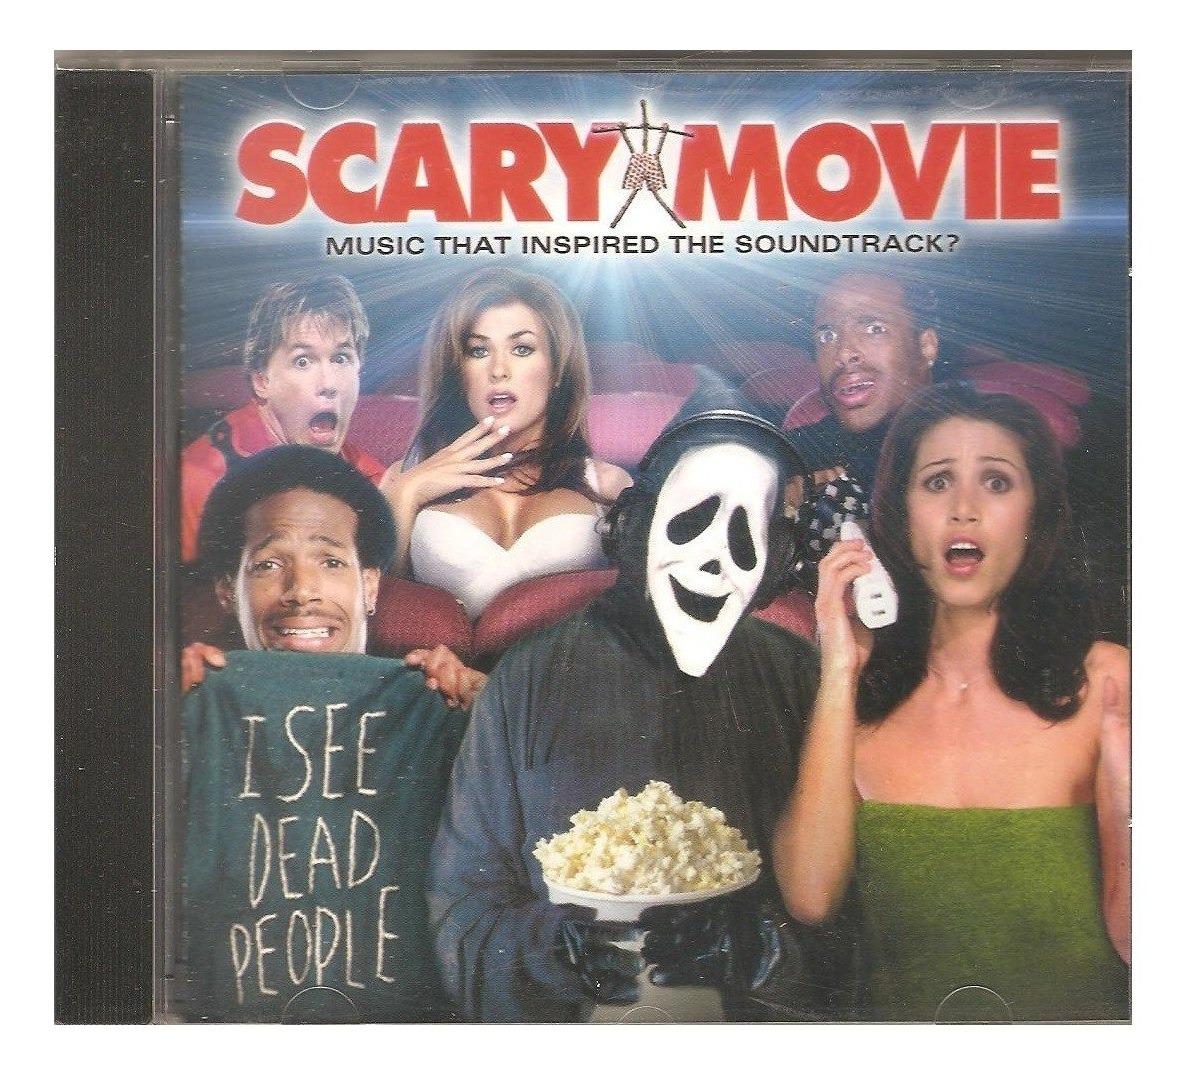 Black Eyed Peas Tupac Shakur Save Ferris Lifelong Cd Scary M